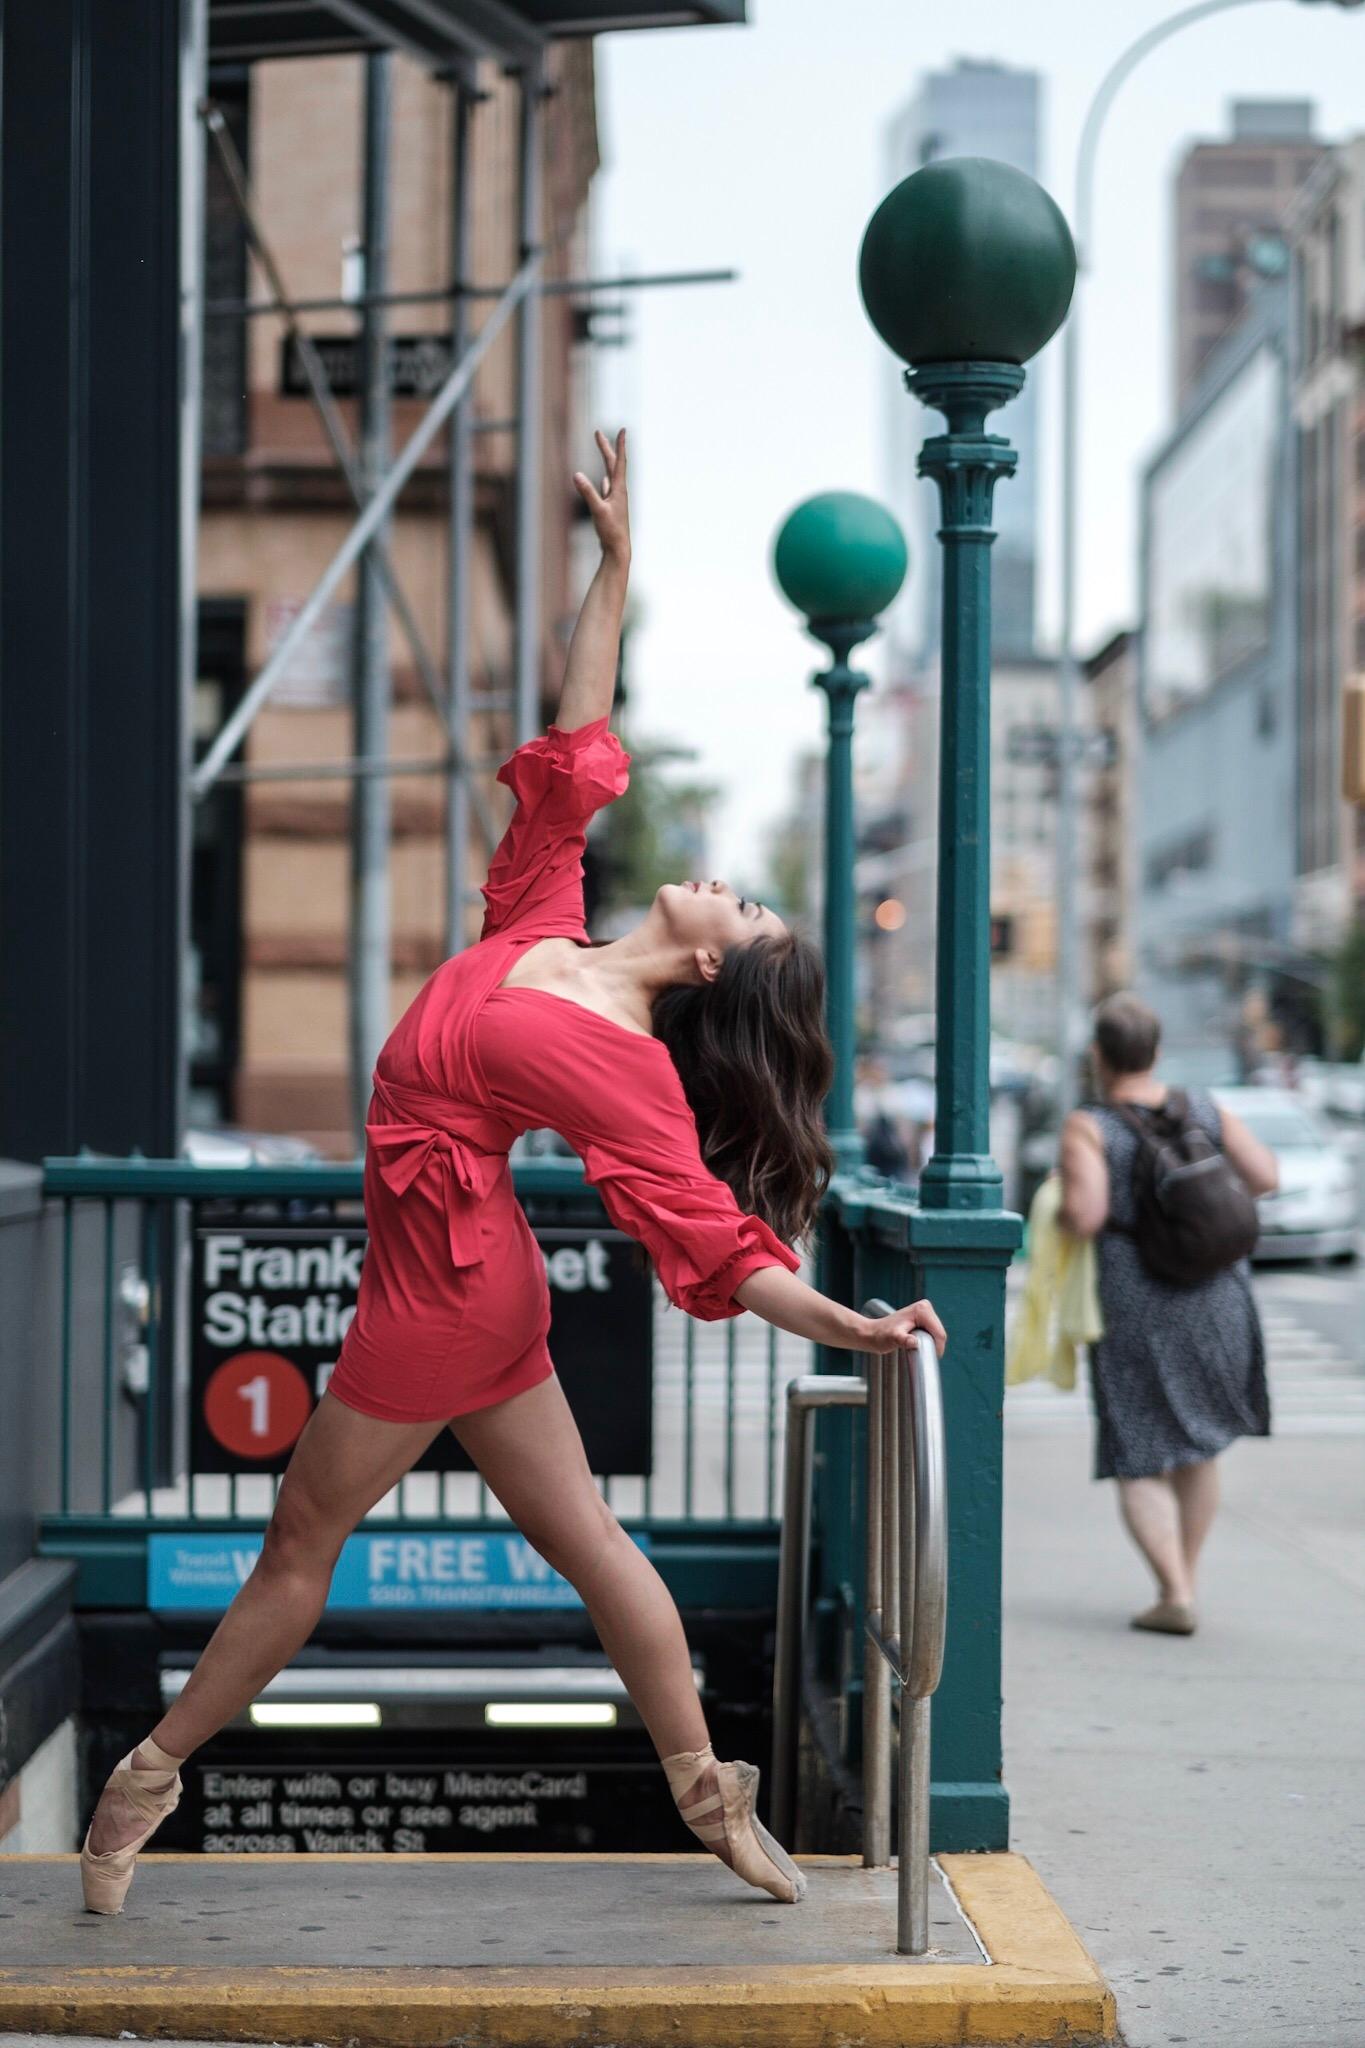 Photo taken by Omar Z Rombles for #OZR_Dance